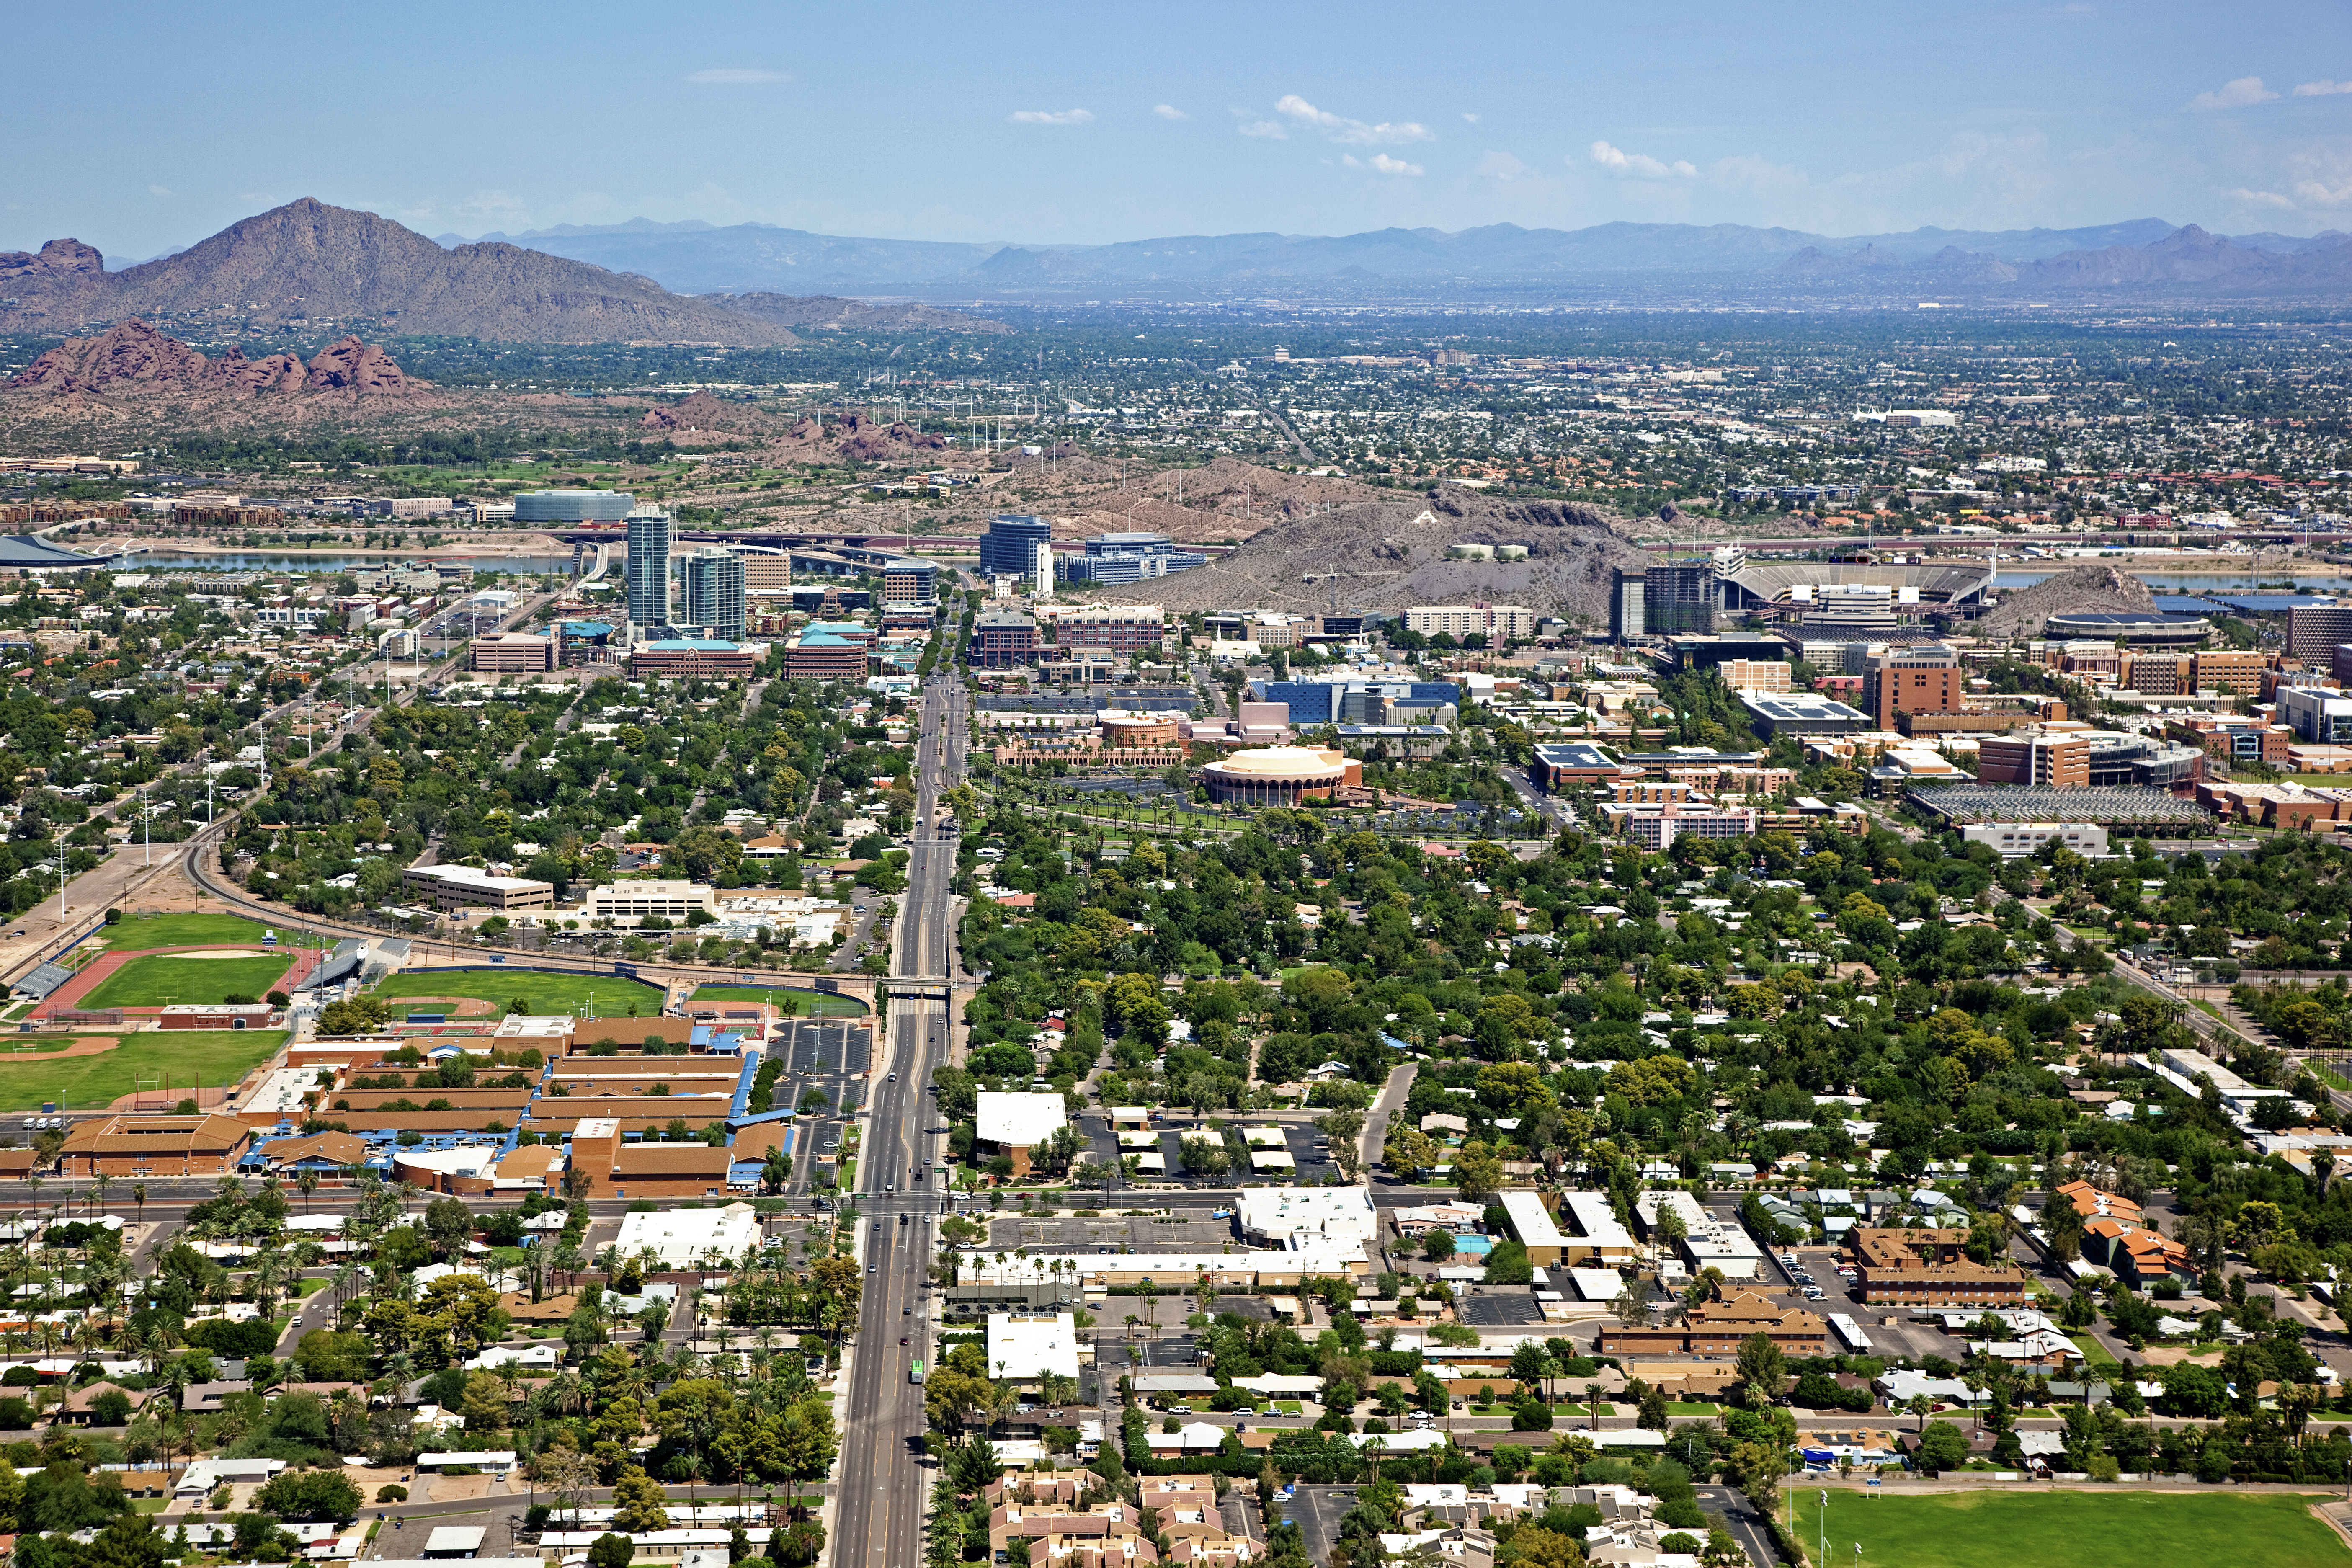 Desert city seen from above.